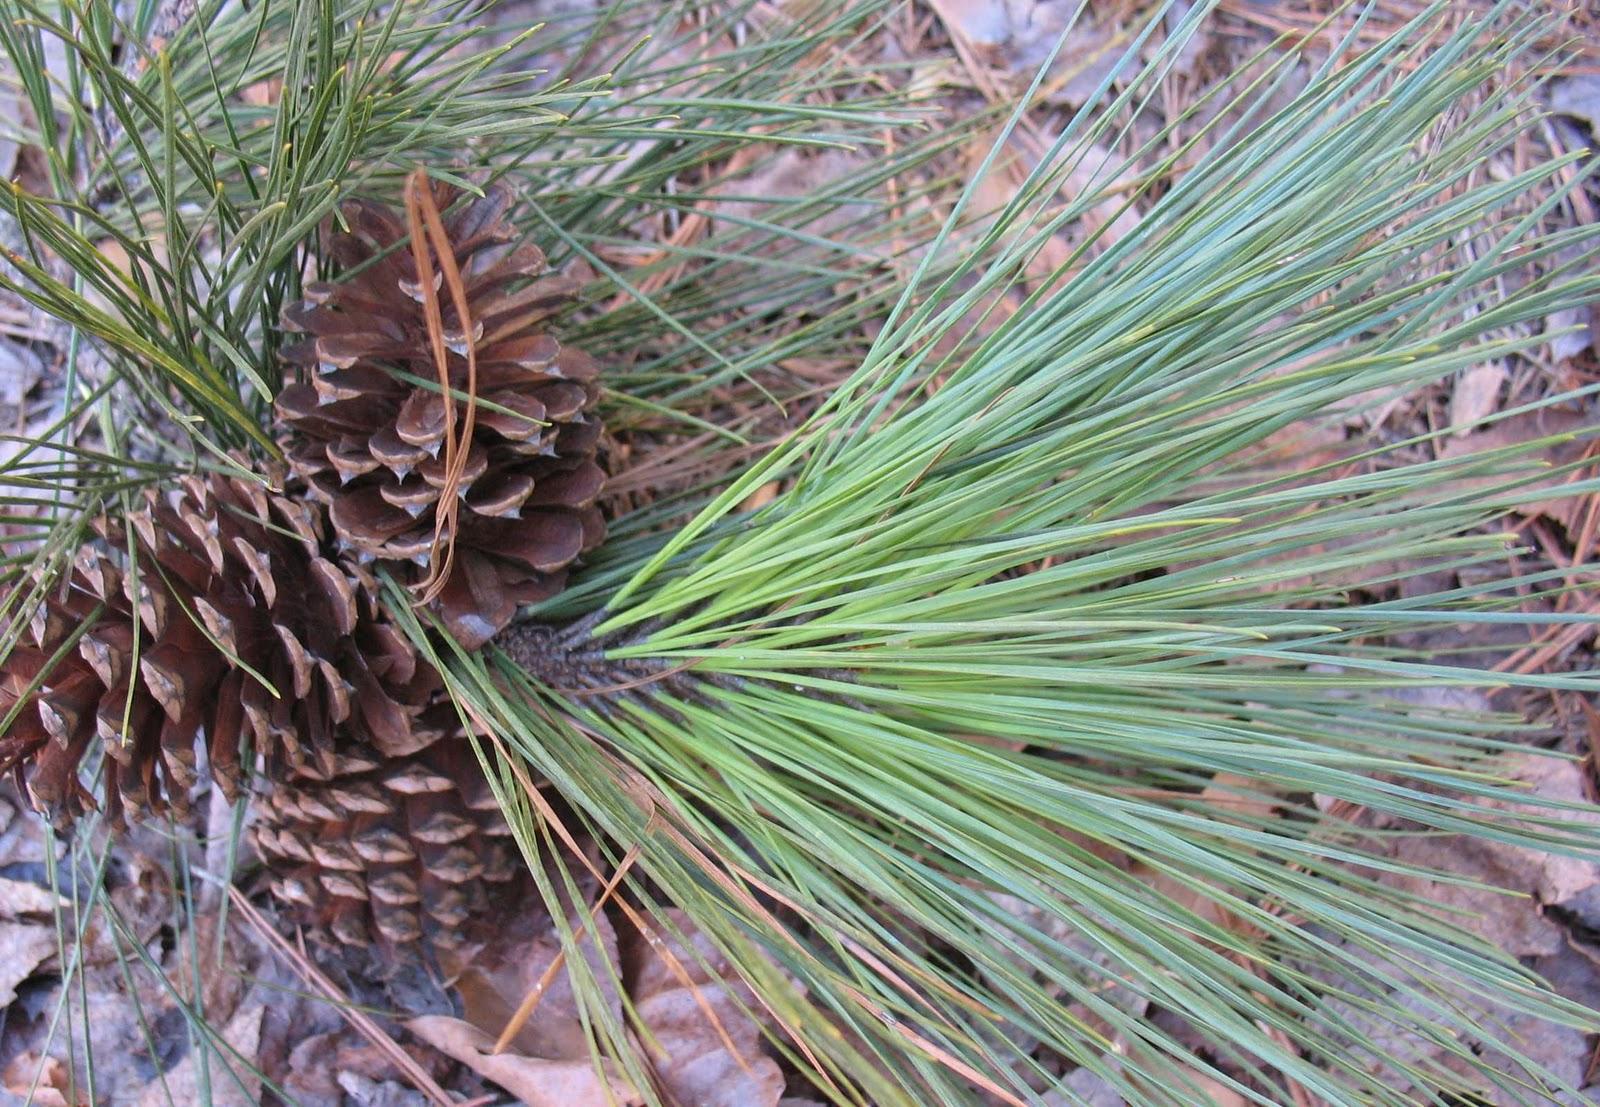 Using Georgia Native Plants: January 2012